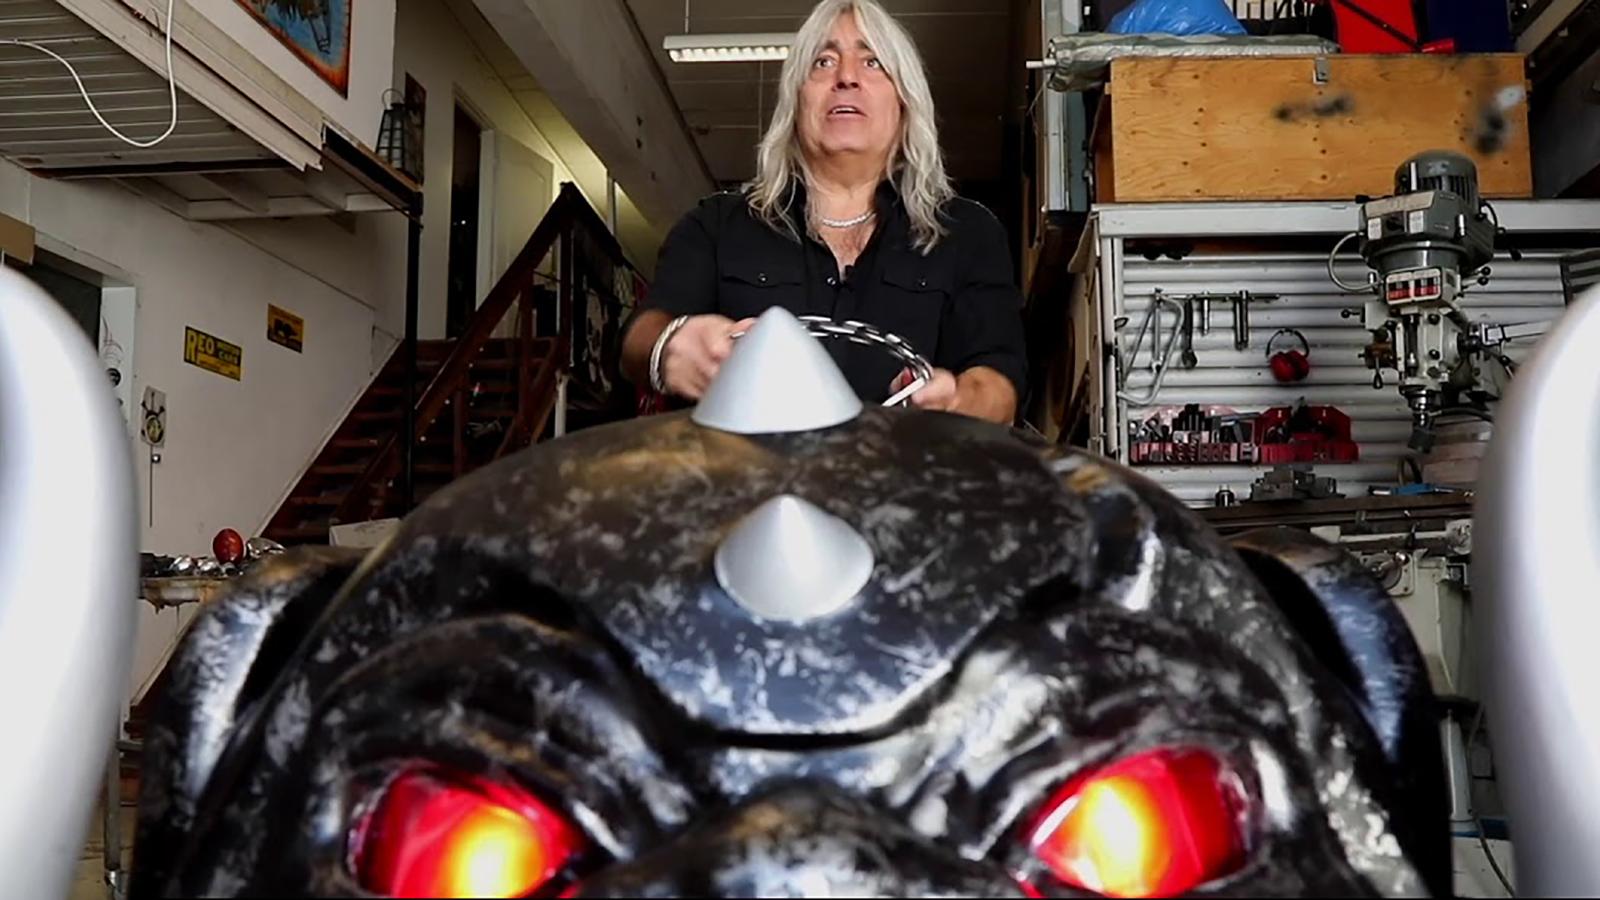 See Motörhead's Mikkey Dee Create Ultra-Pimped Snaggletooth Lawnmower